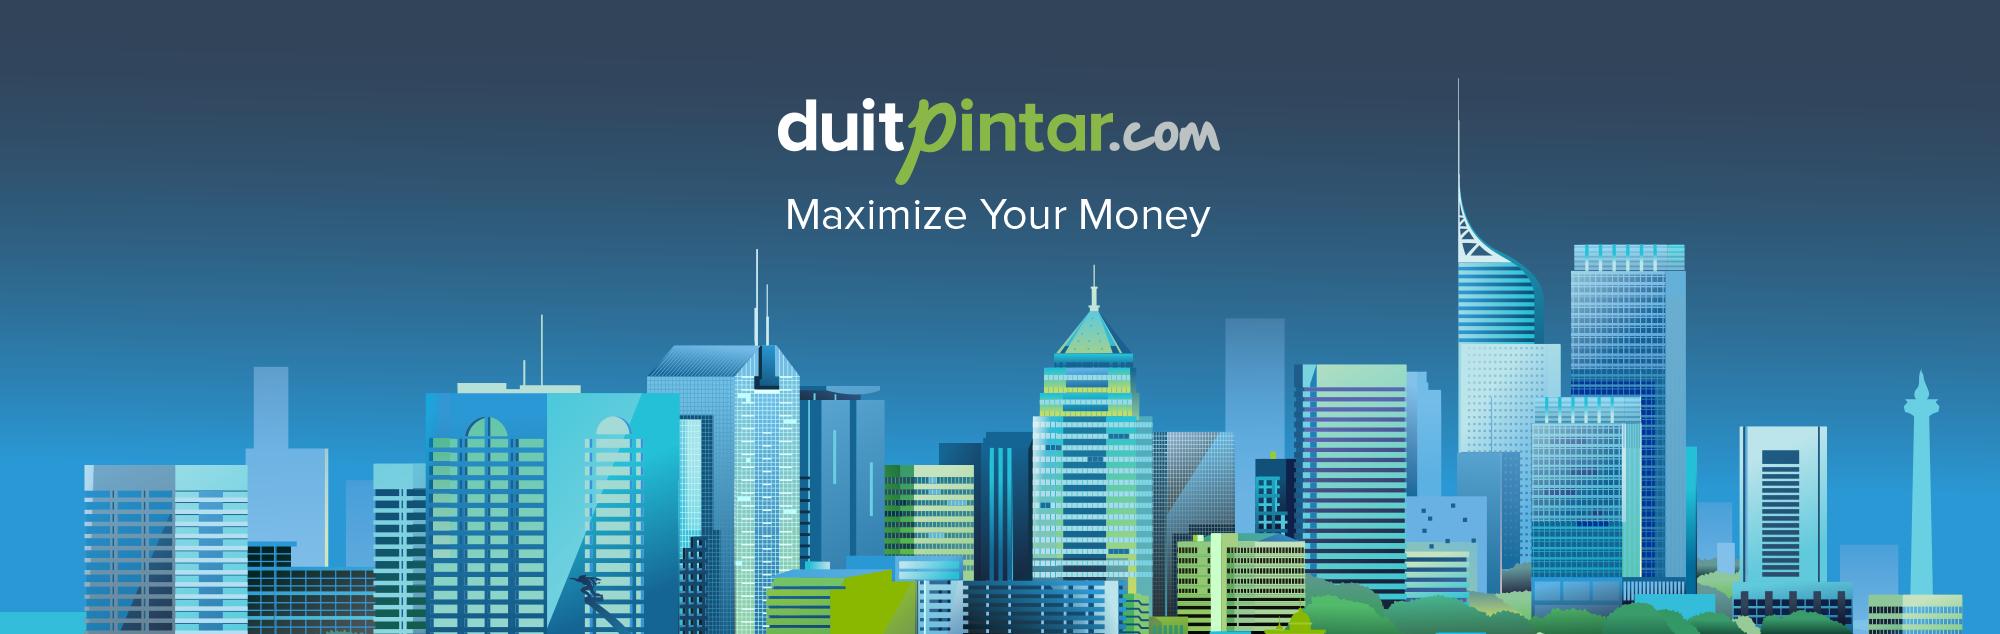 DuitPintar Maximize your financial